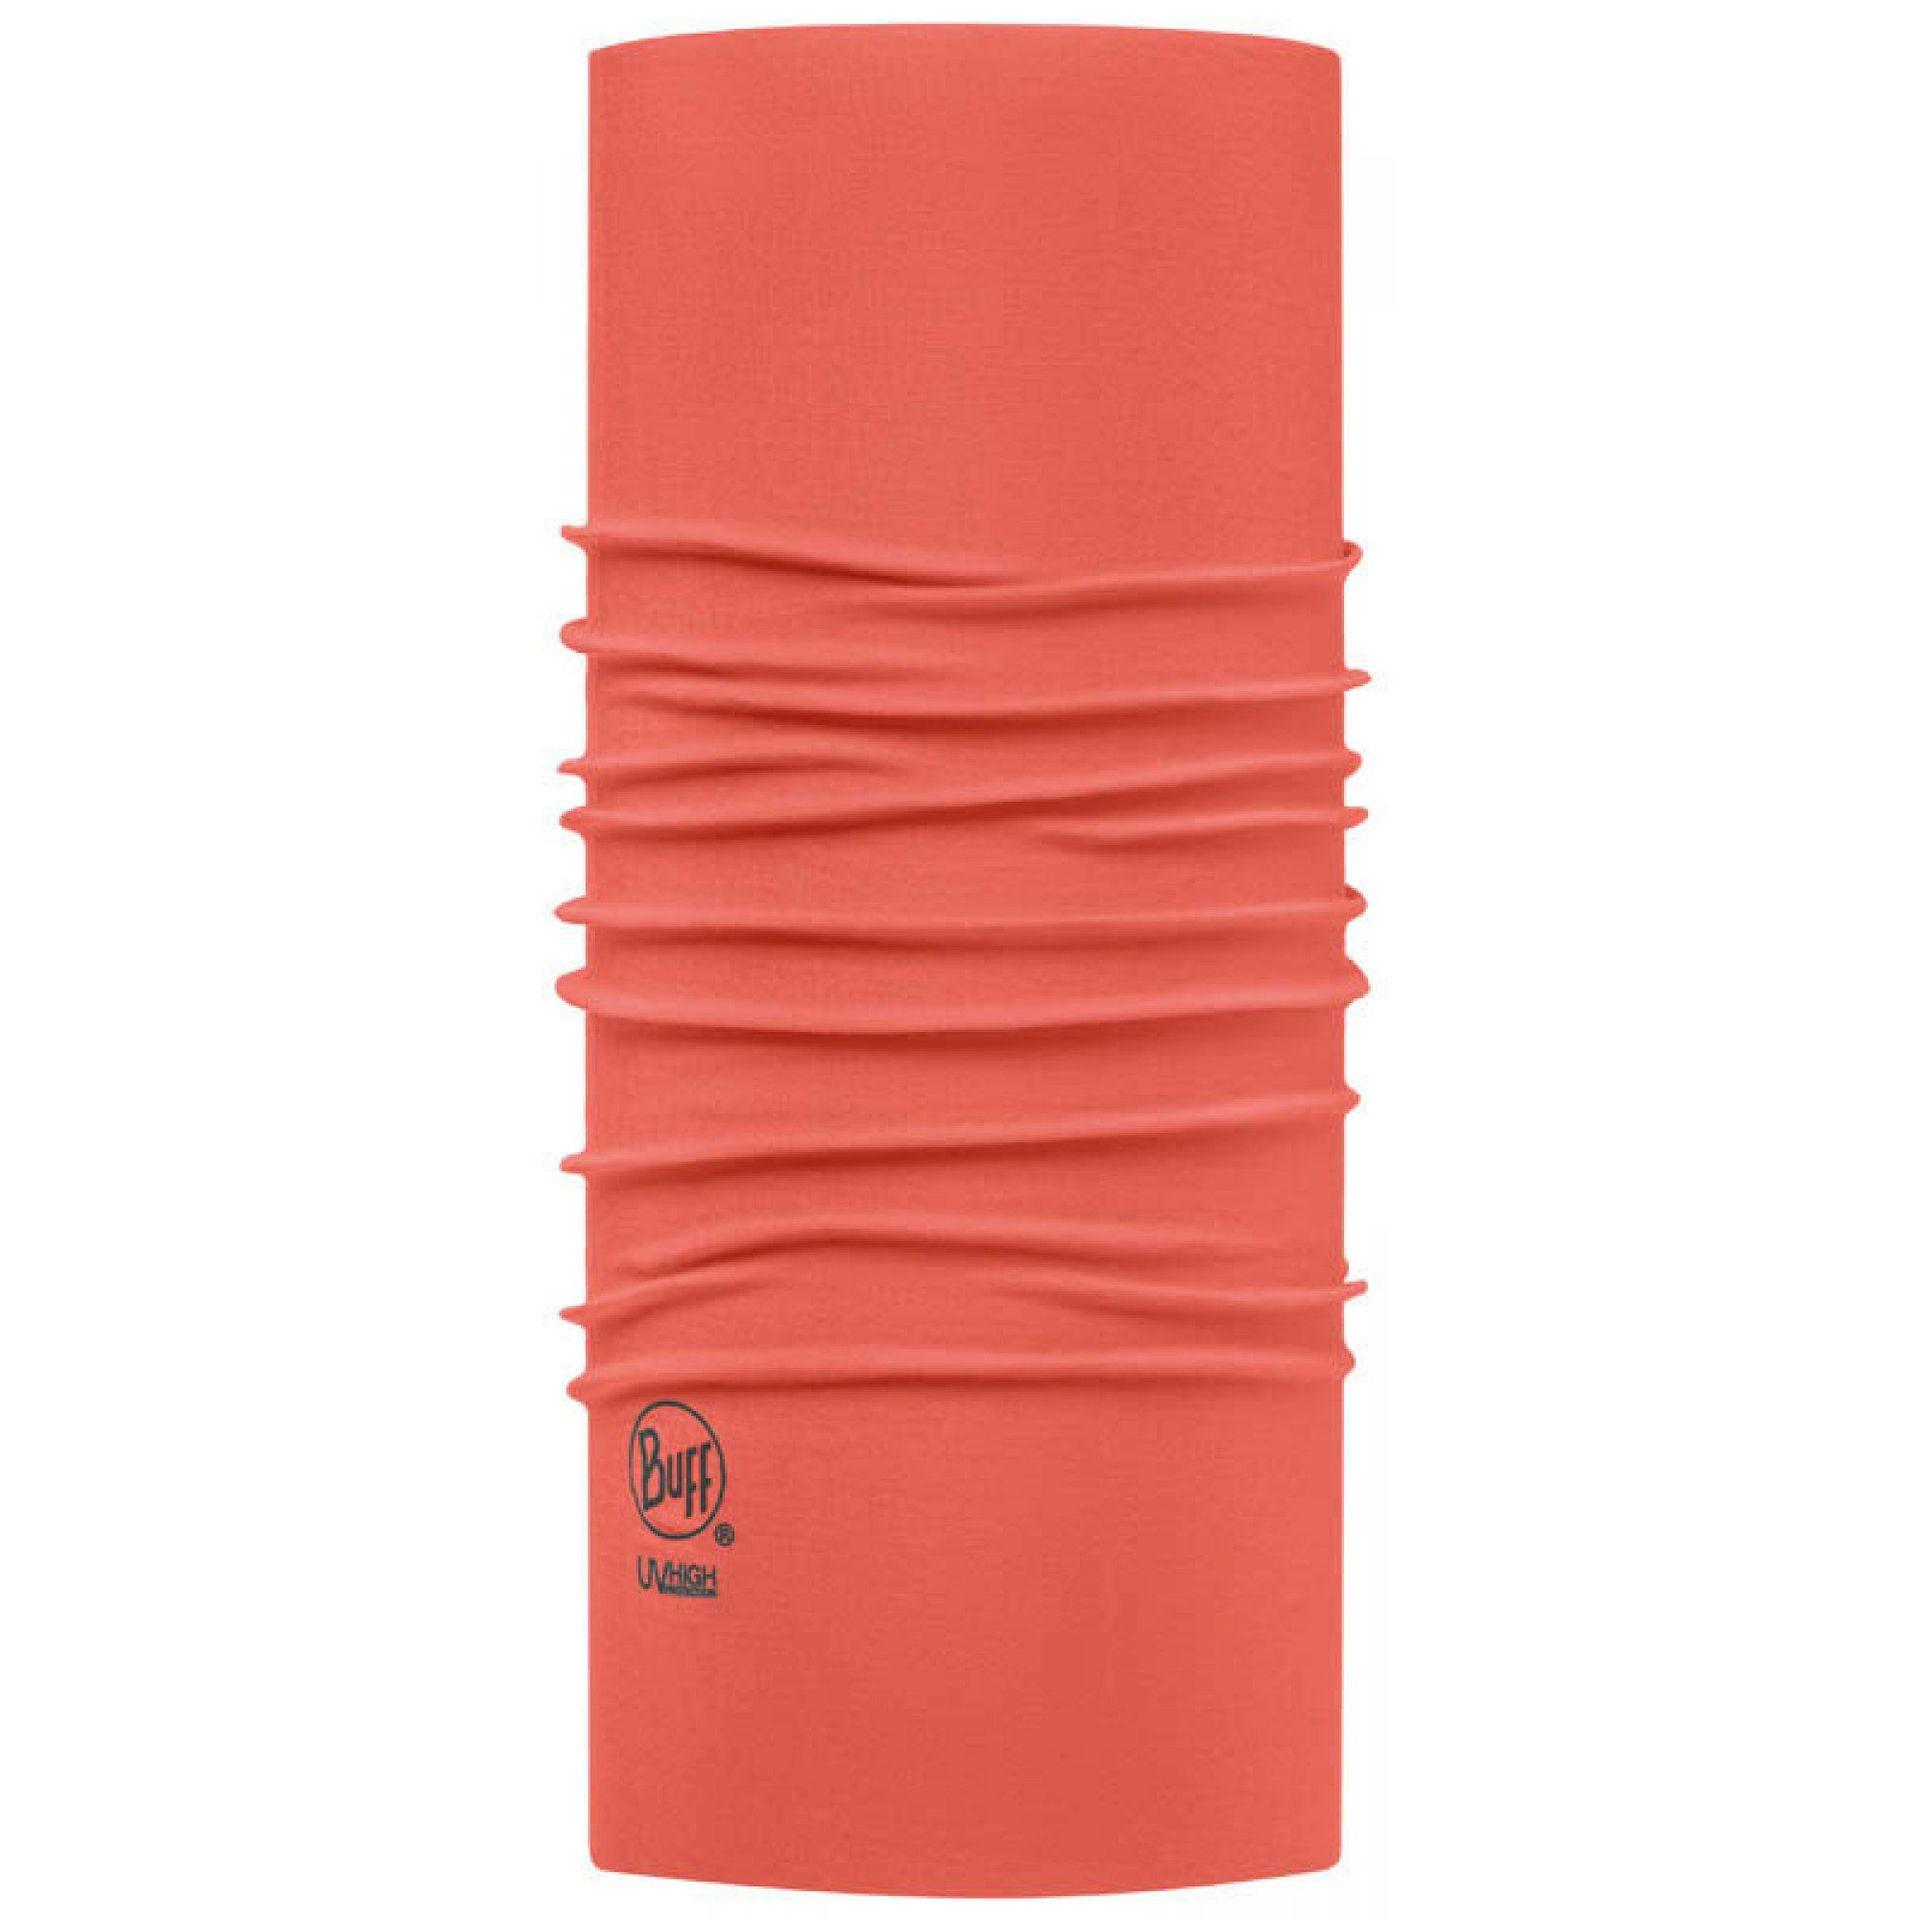 CHUSTA BUFF HIGH UV PROTECTION SOLID GERANIUM ORANGE